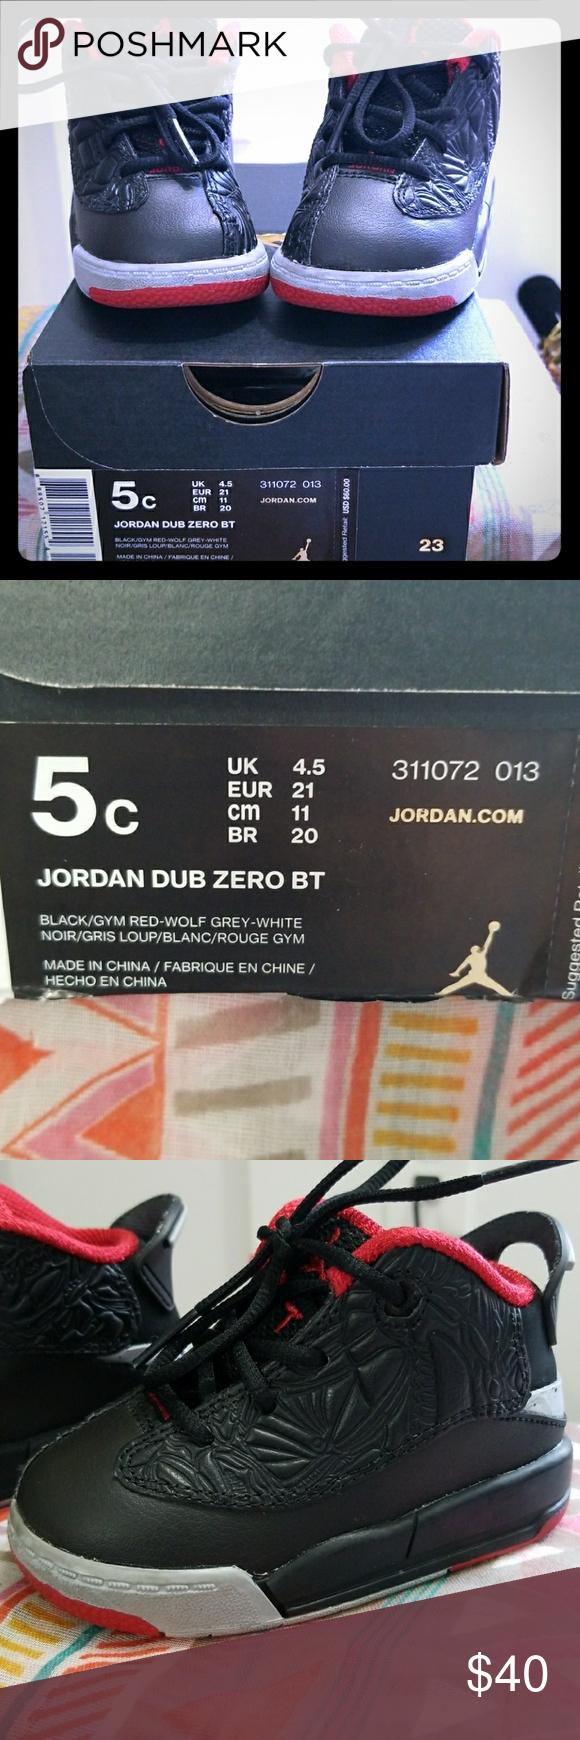 c58e7f9d01efff Kids Jordan Dub Zero